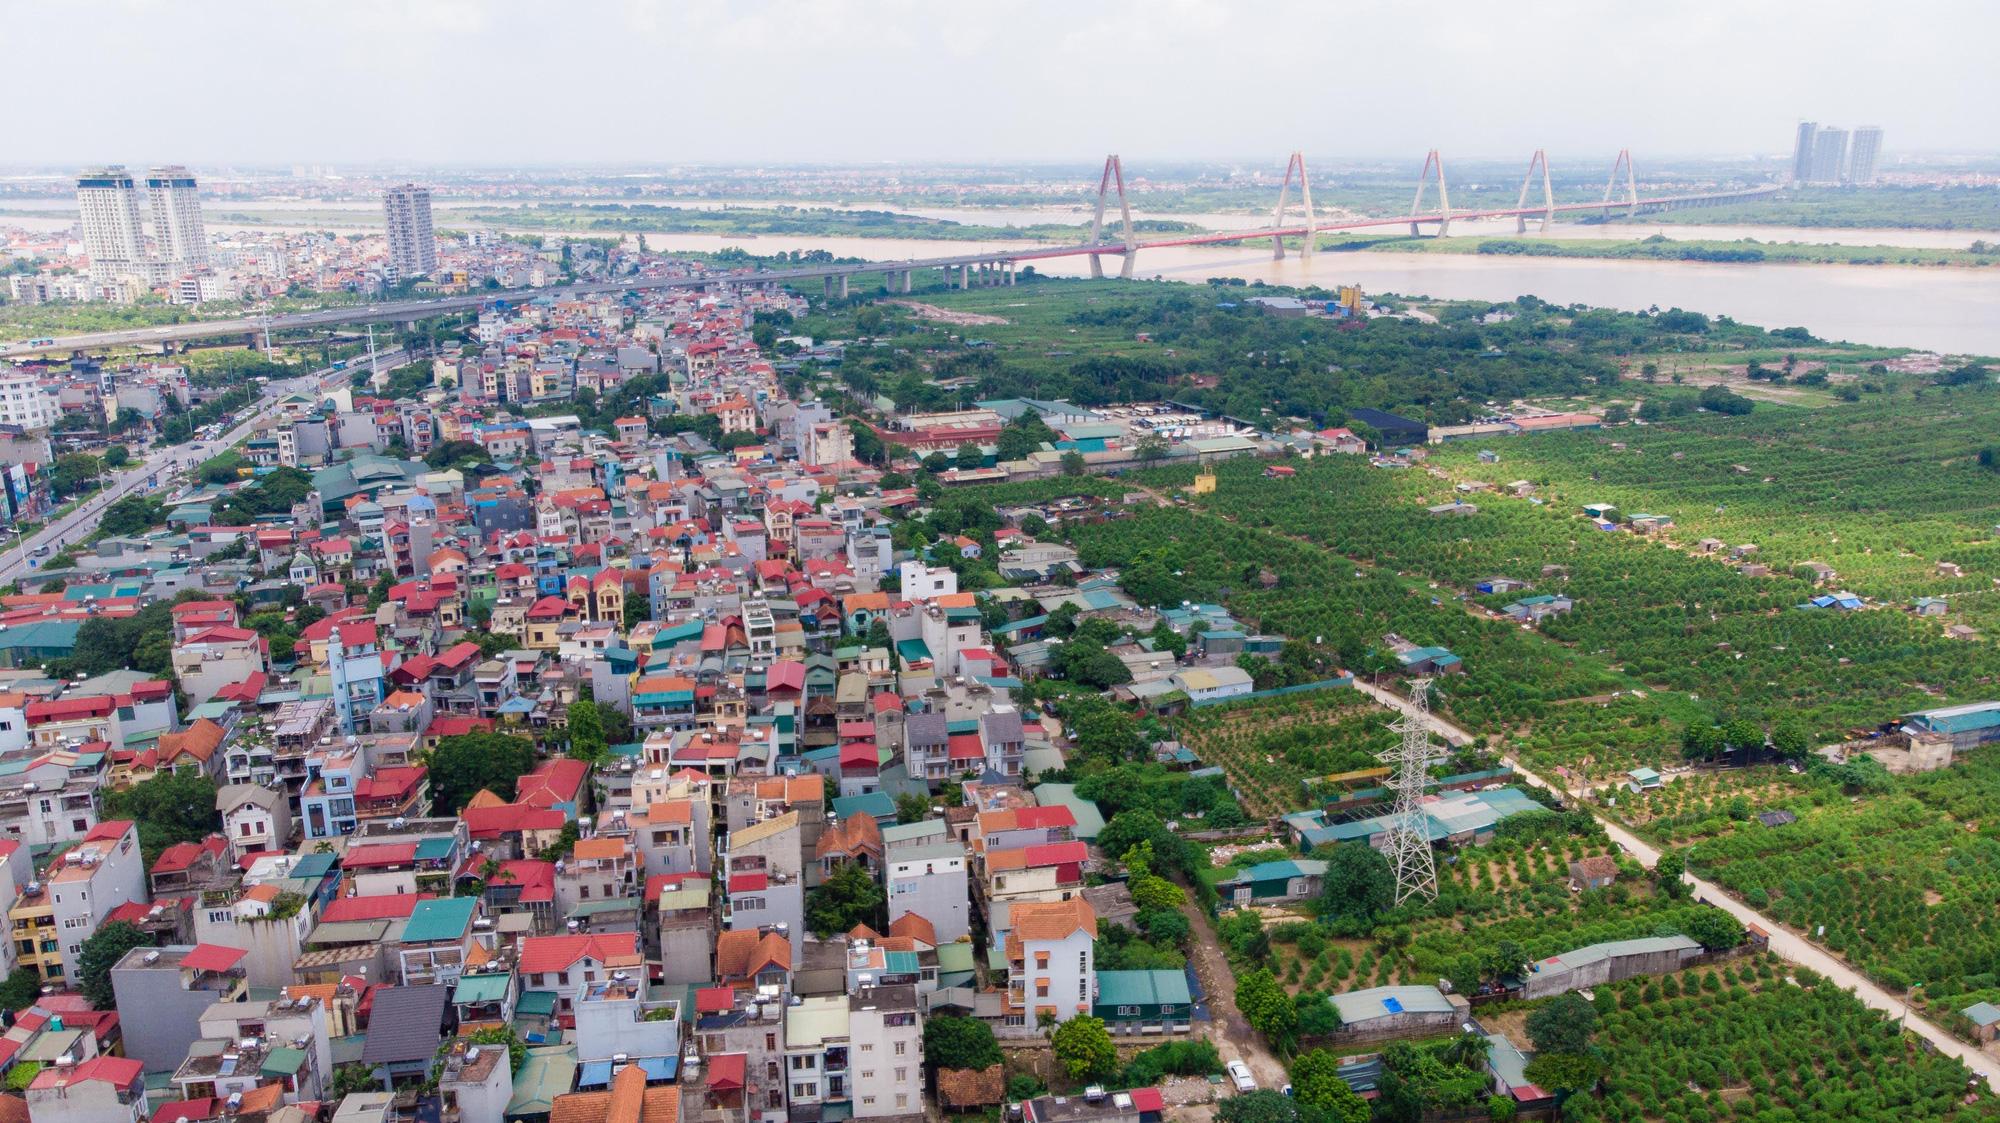 Quy-hoac-kinh-te-va-do-thi-Ha-Noi-den-nam-2030